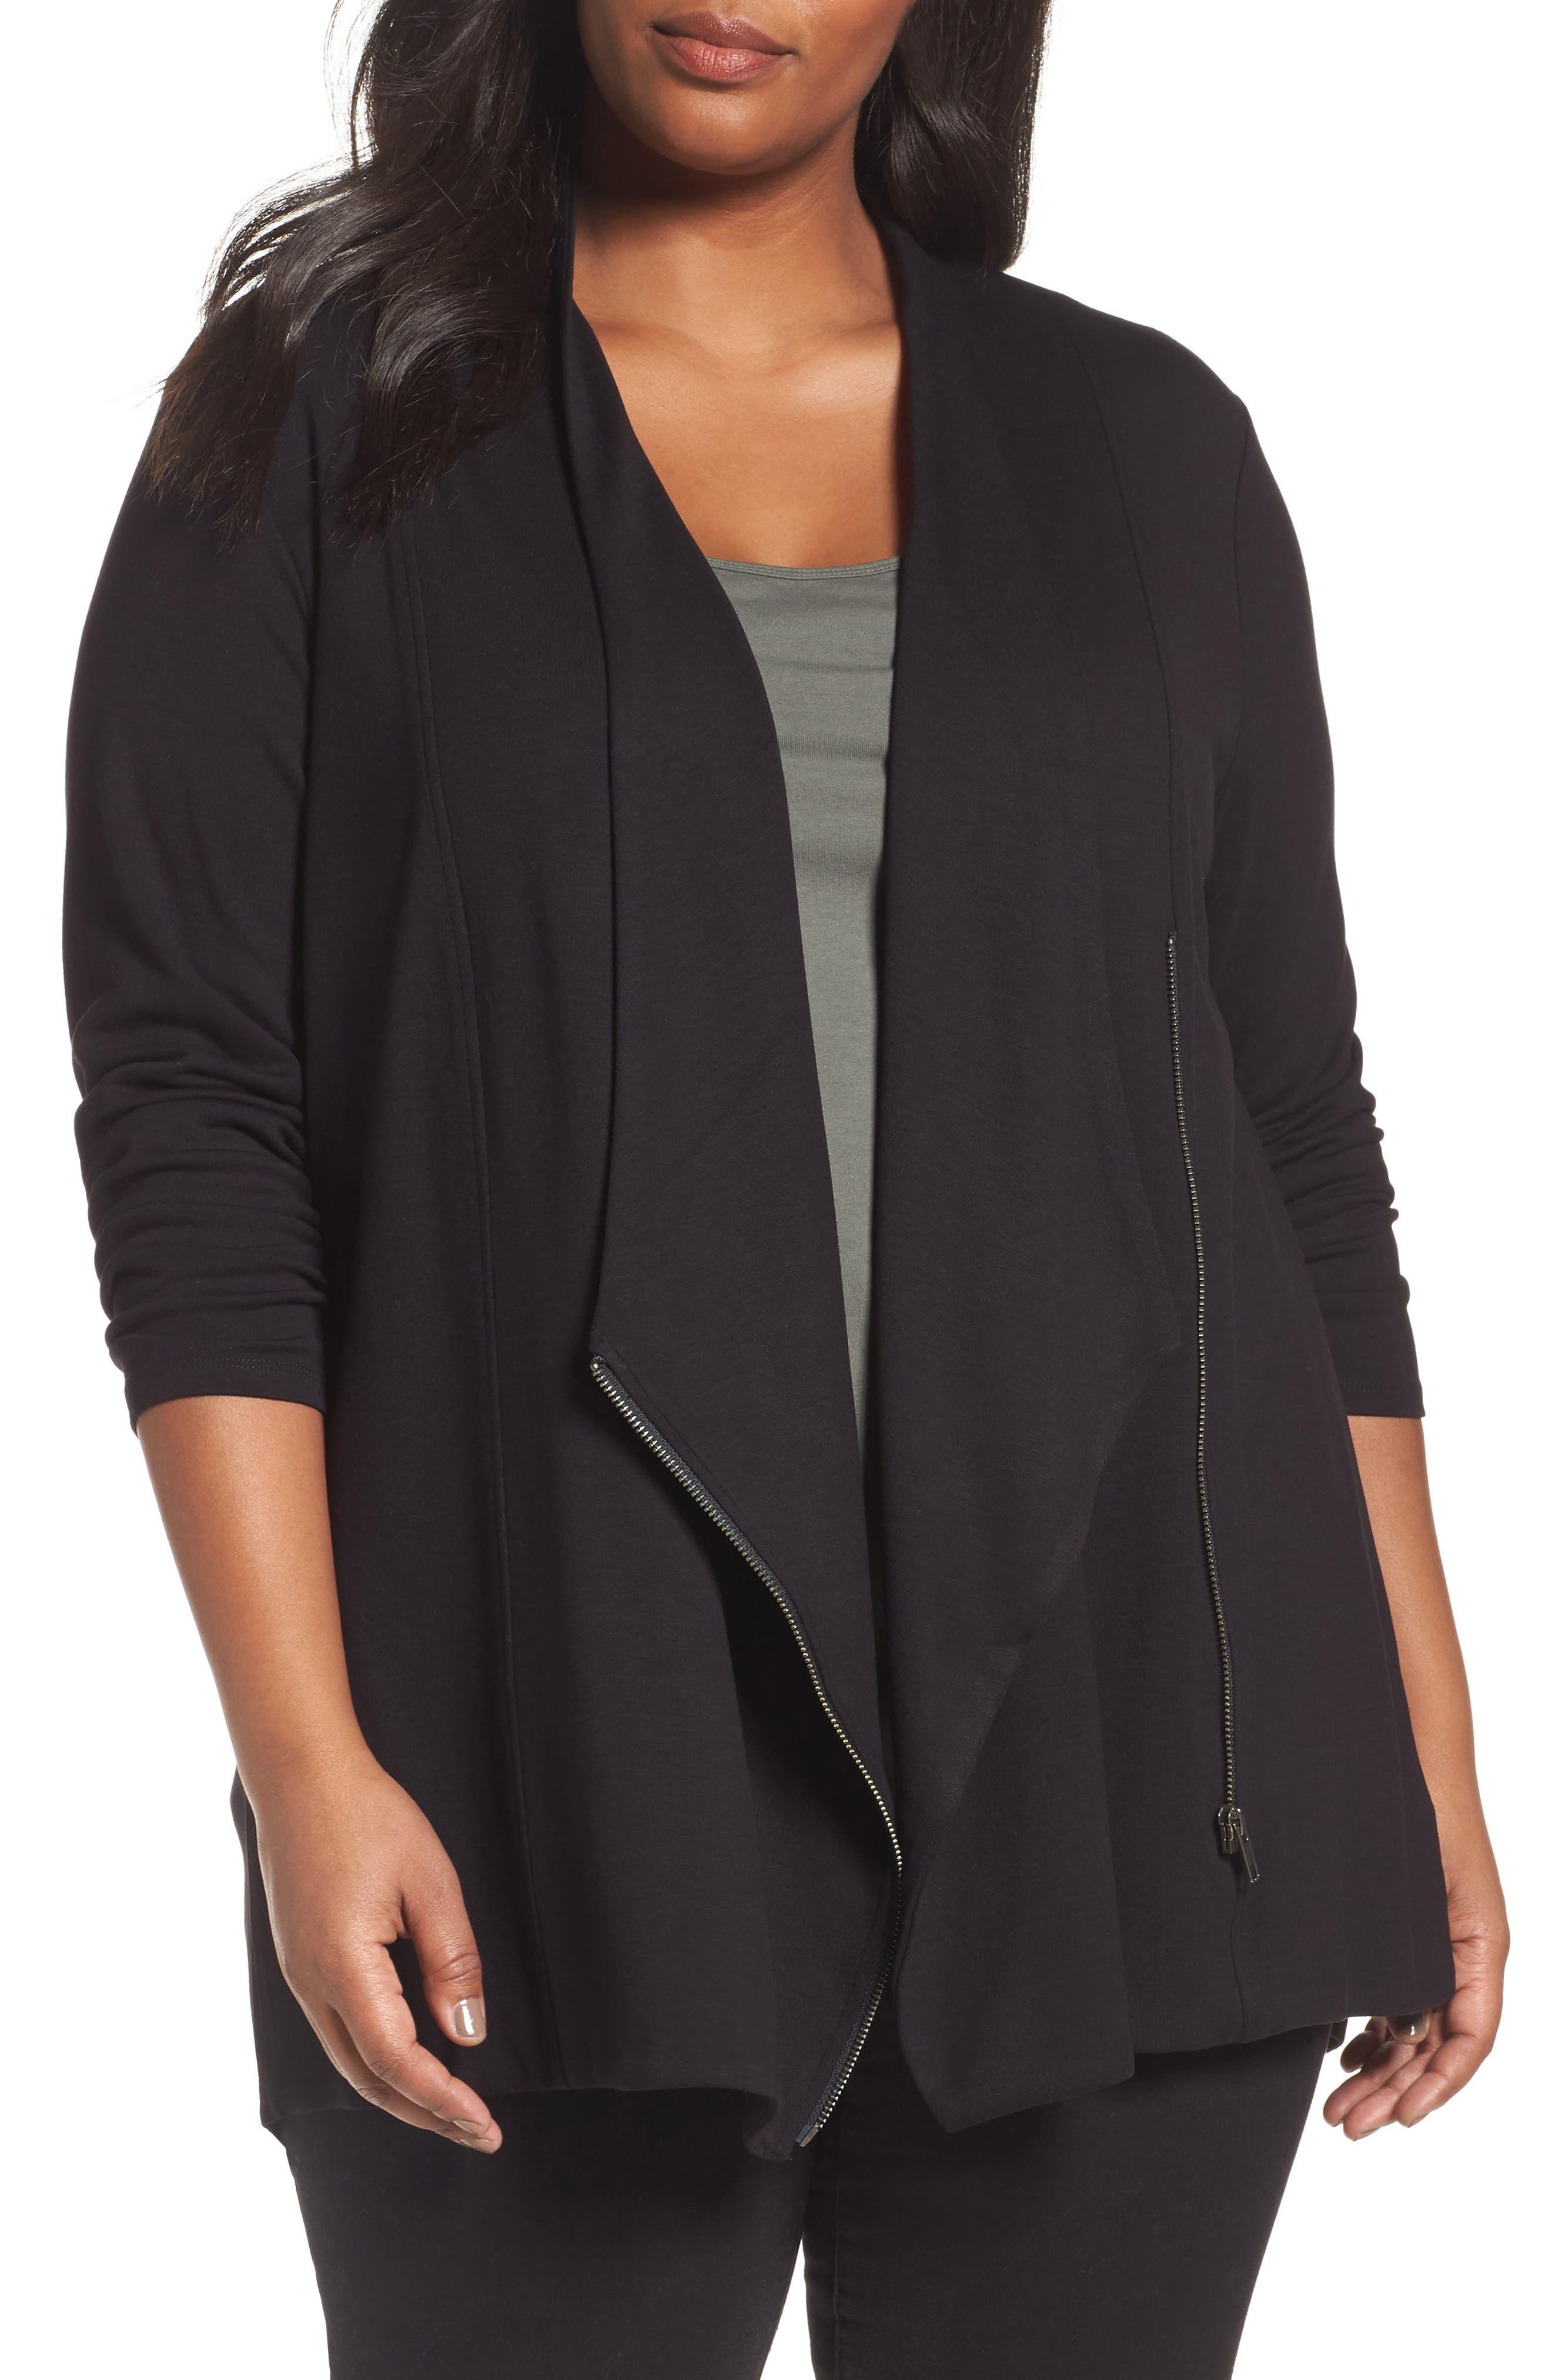 Main Image - NIC+ZOE Studio Asymmetrical Zip Jacket (Plus Size)